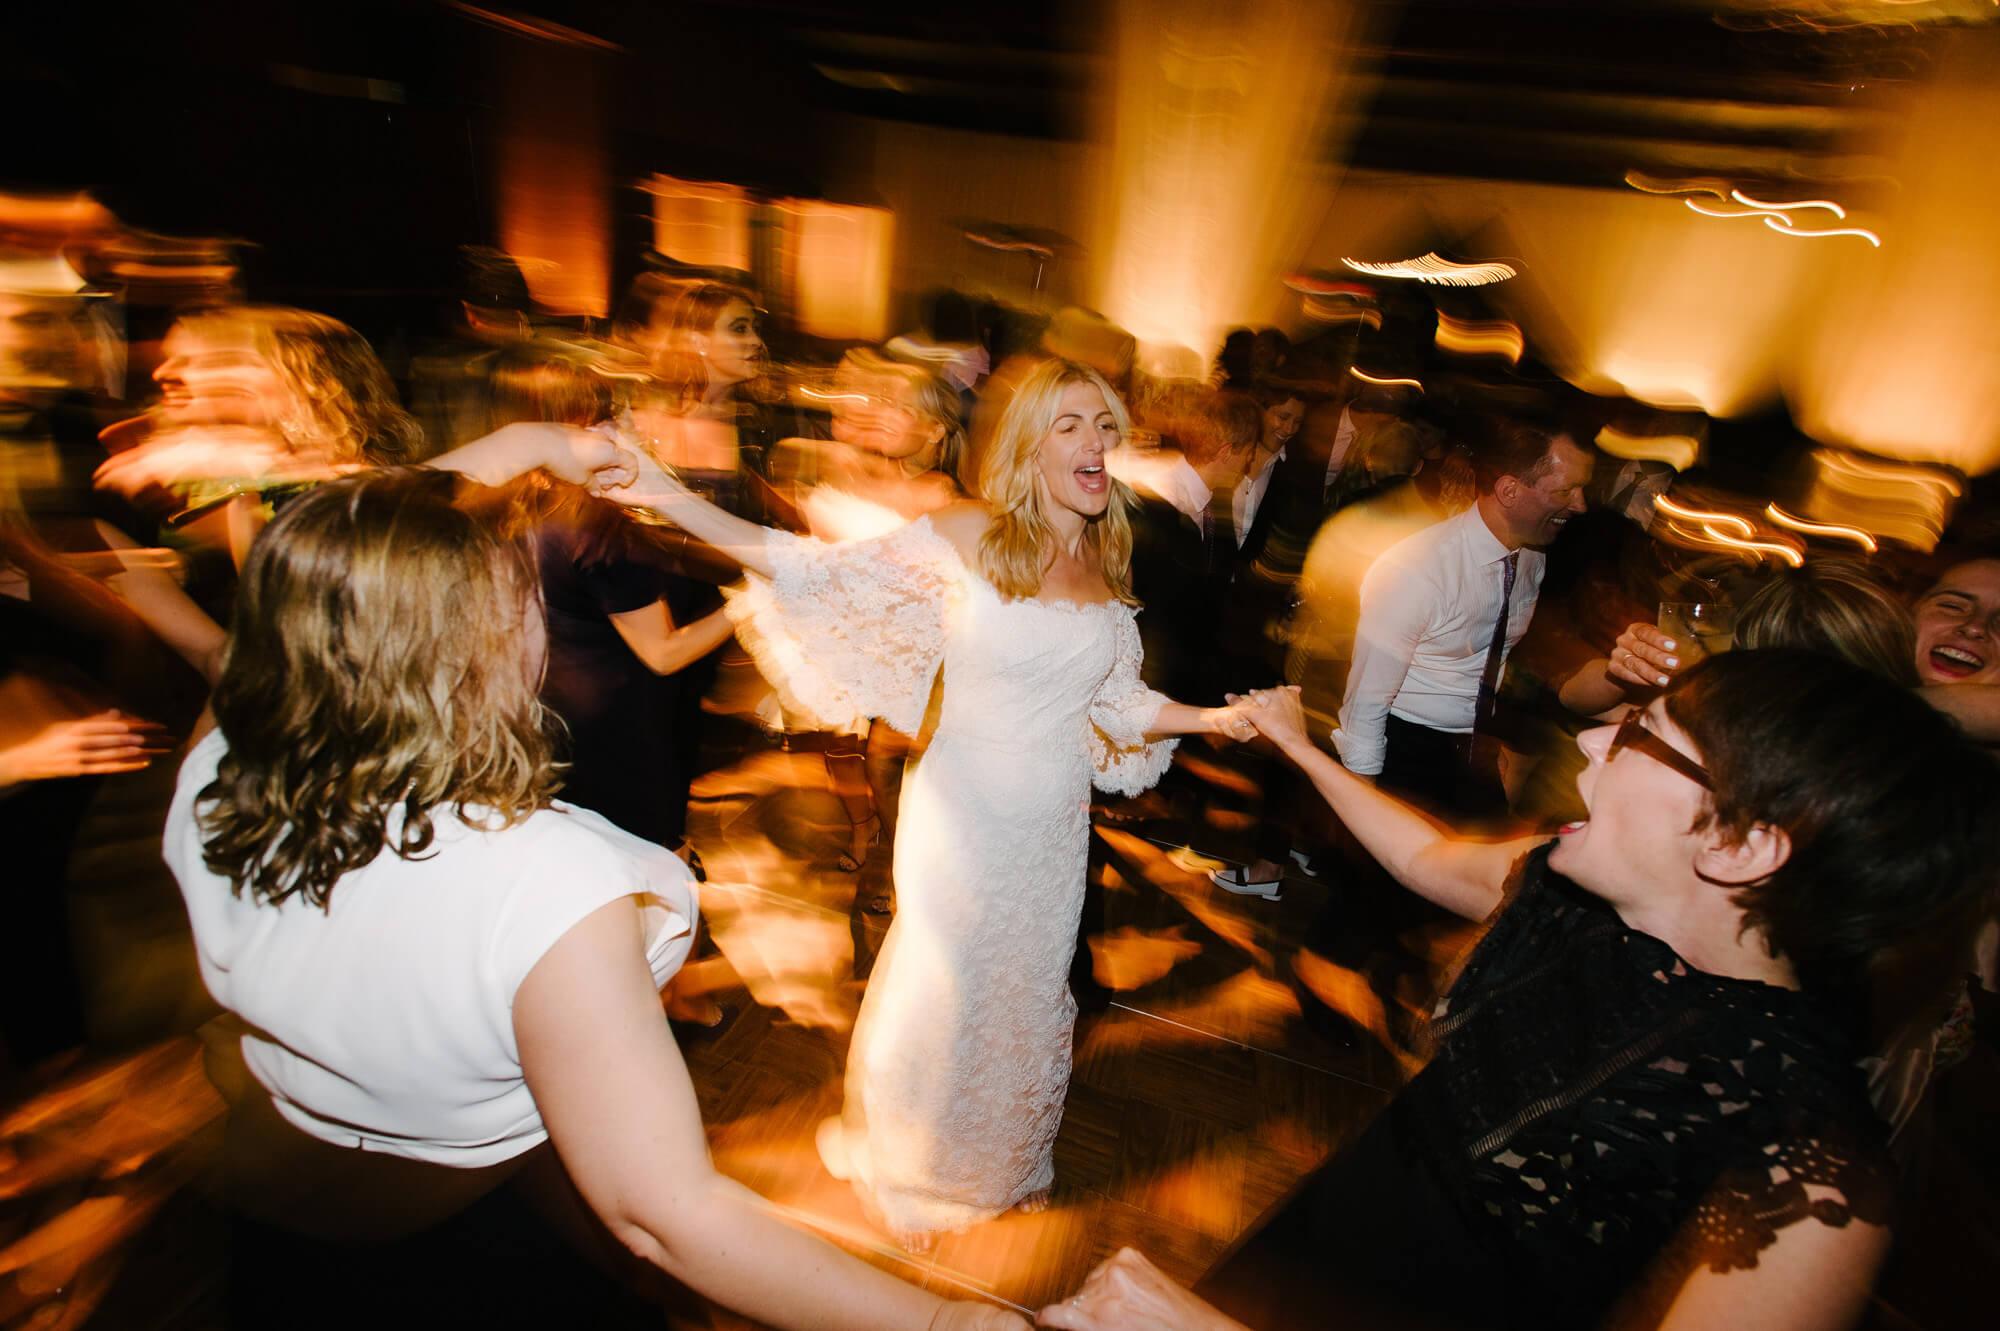 los-olivos-firestone-winery-destination-wedding-central-coast-wedding-photographer-31.jpg